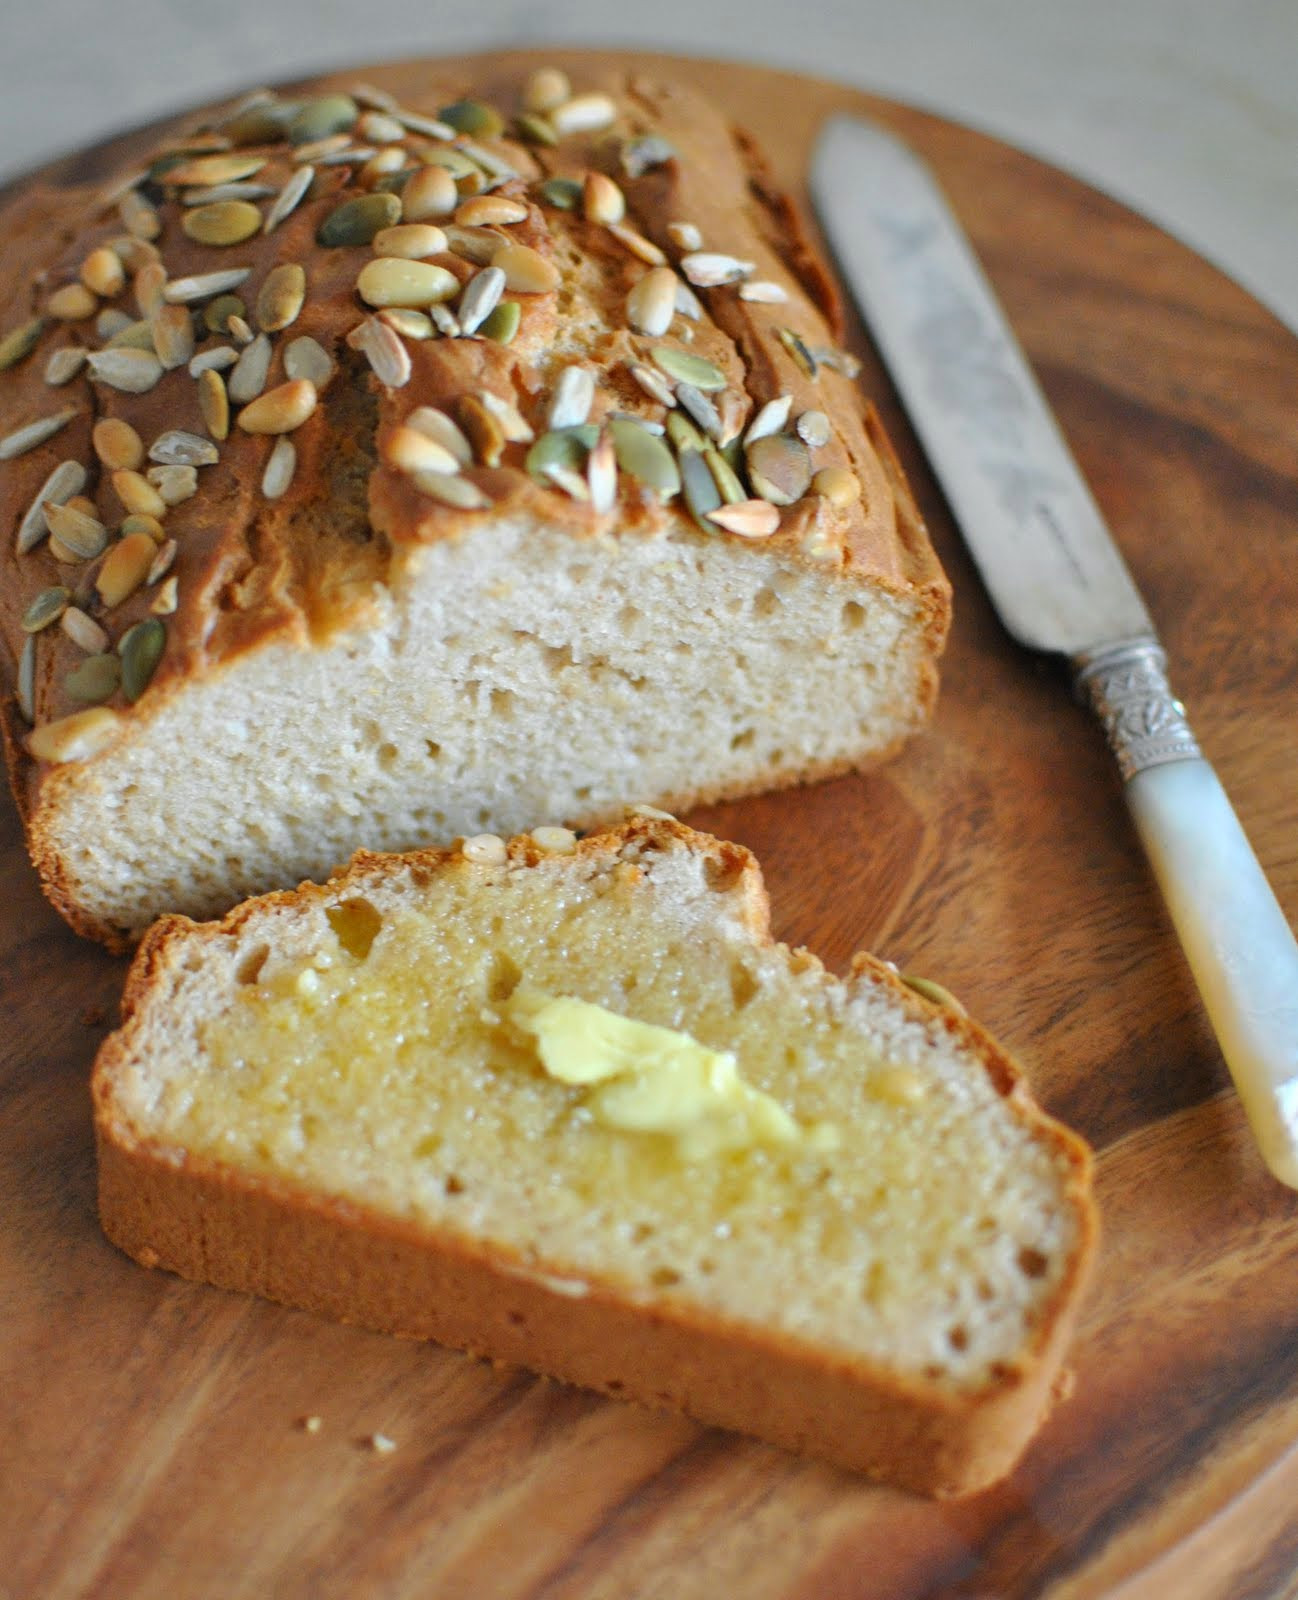 Best Bread Machine For Gluten Free Bread  Cool Kitchen Stuff Top Gluten Free Bread Machines Reviews